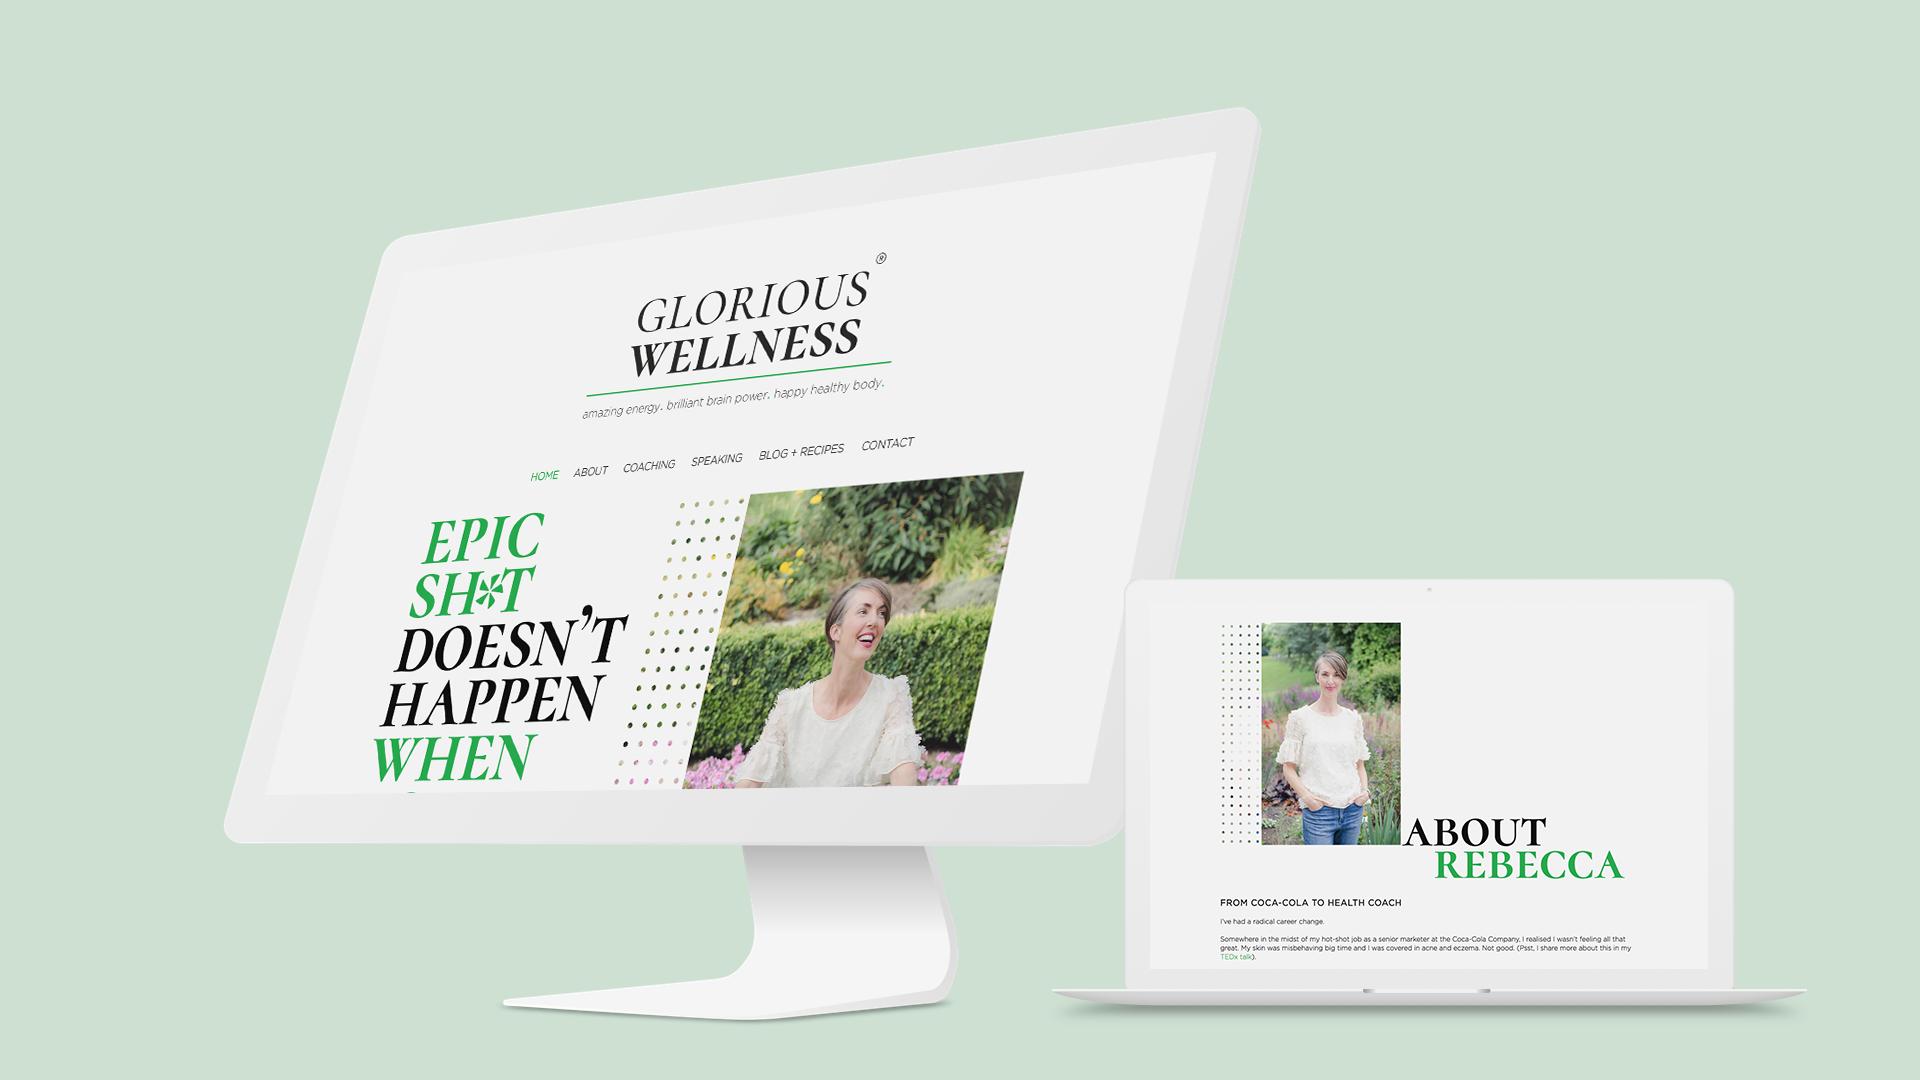 bgsd-branding-web-design-glorious-wellness.jpg